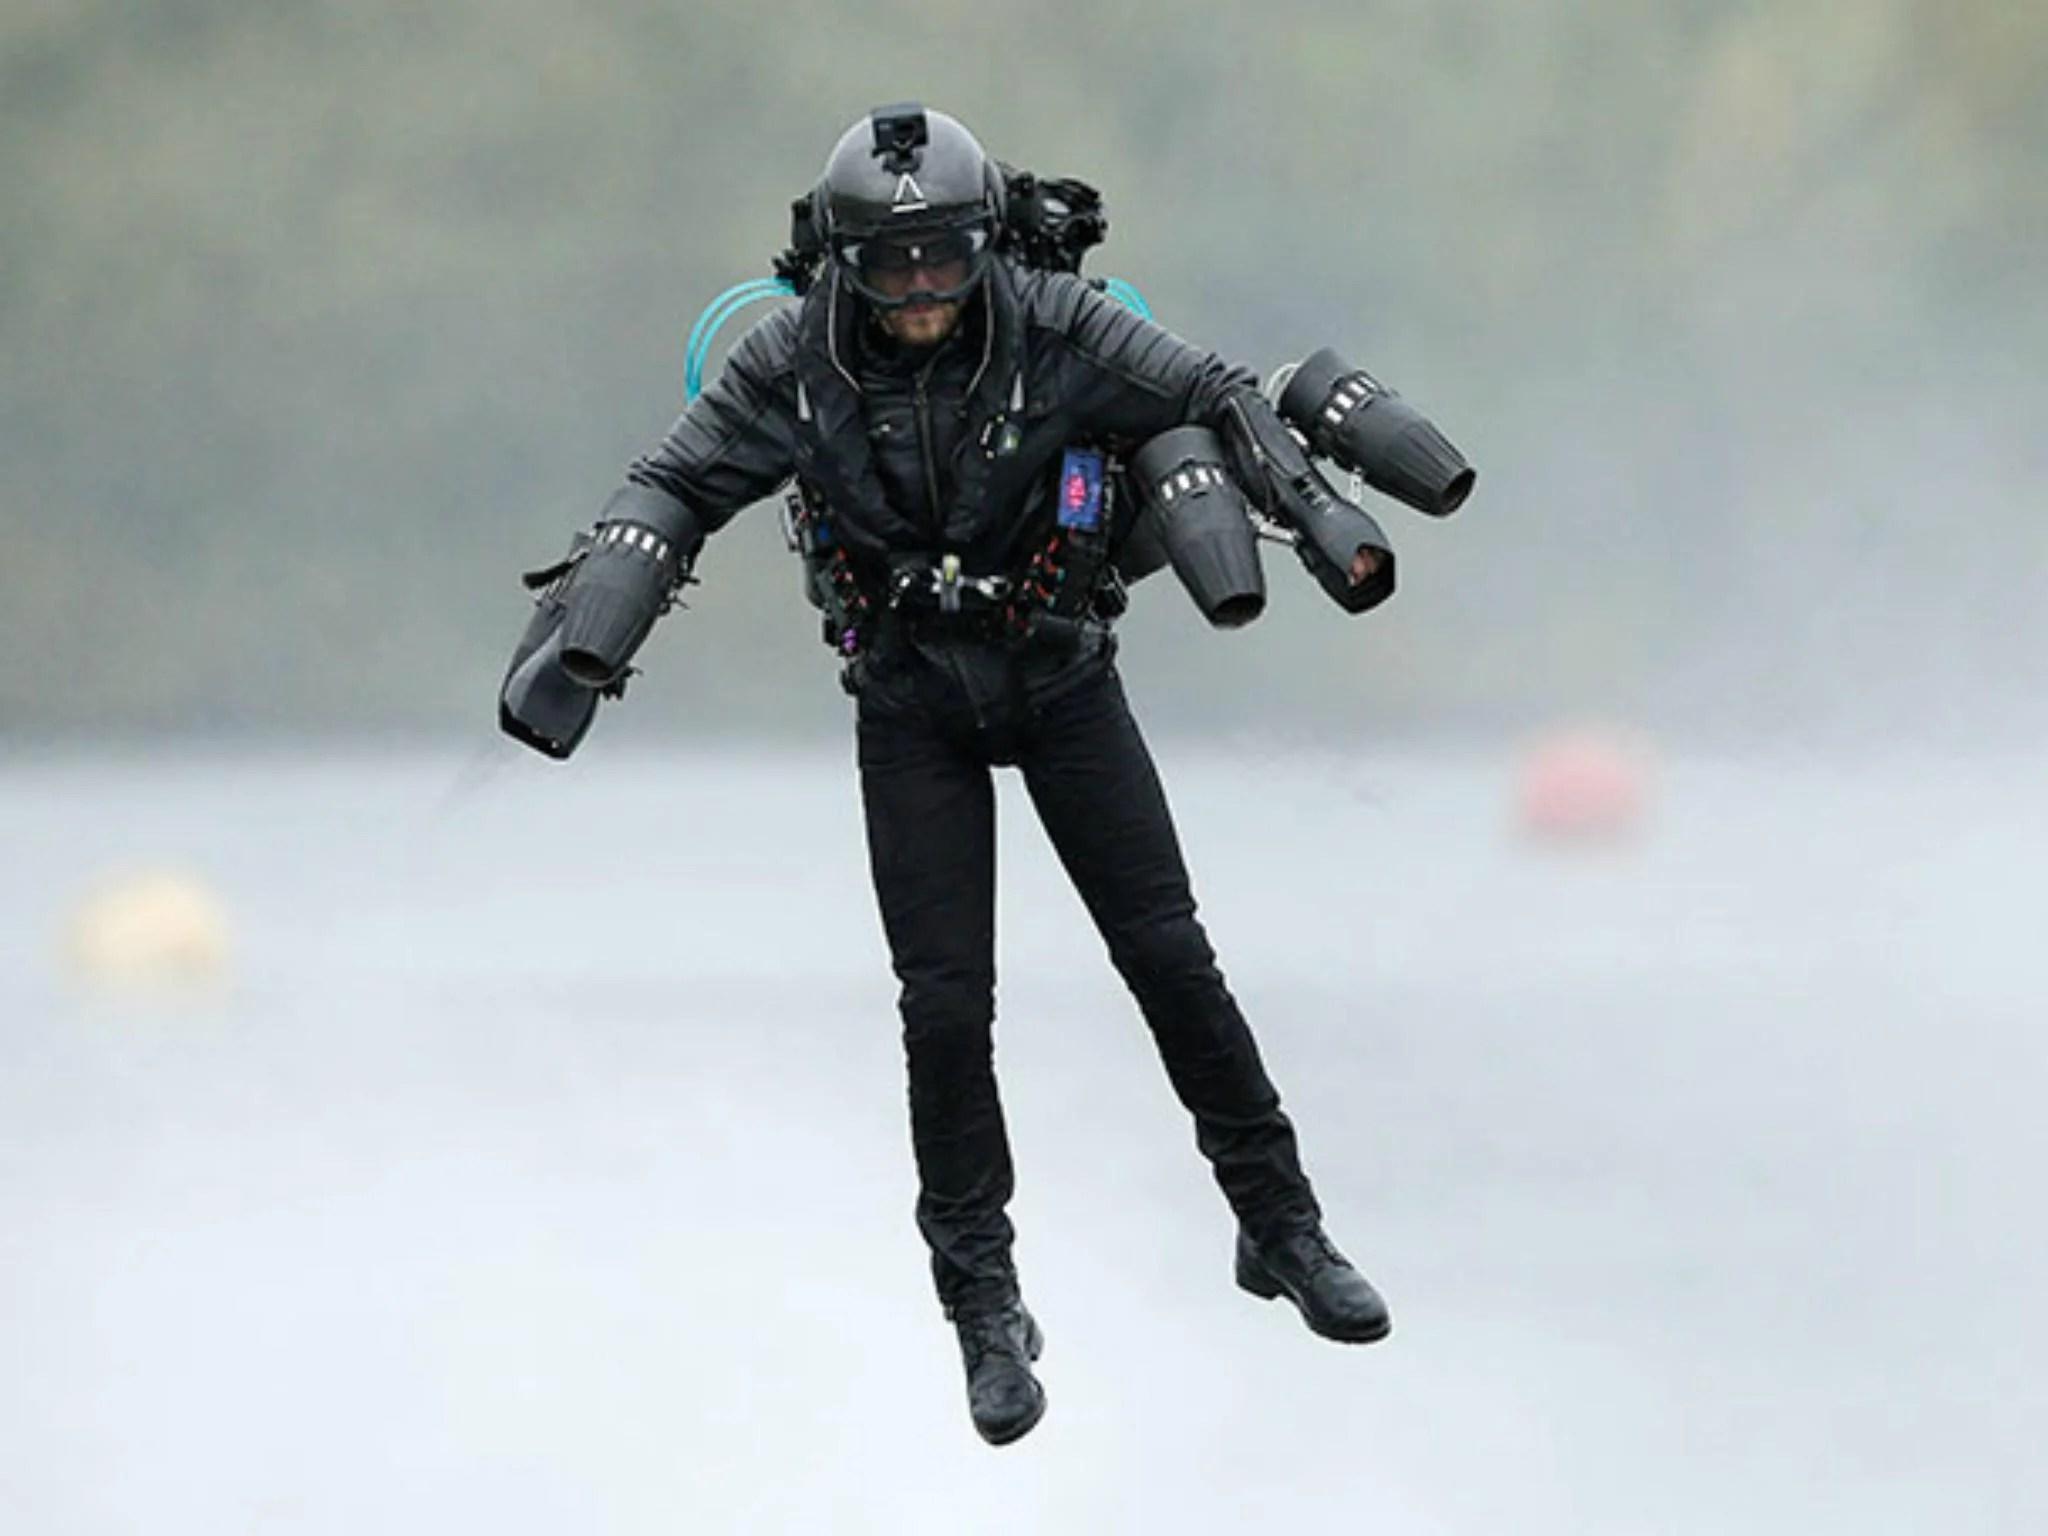 Iron Man Style Flight Suit Inventor Sets Guinness World